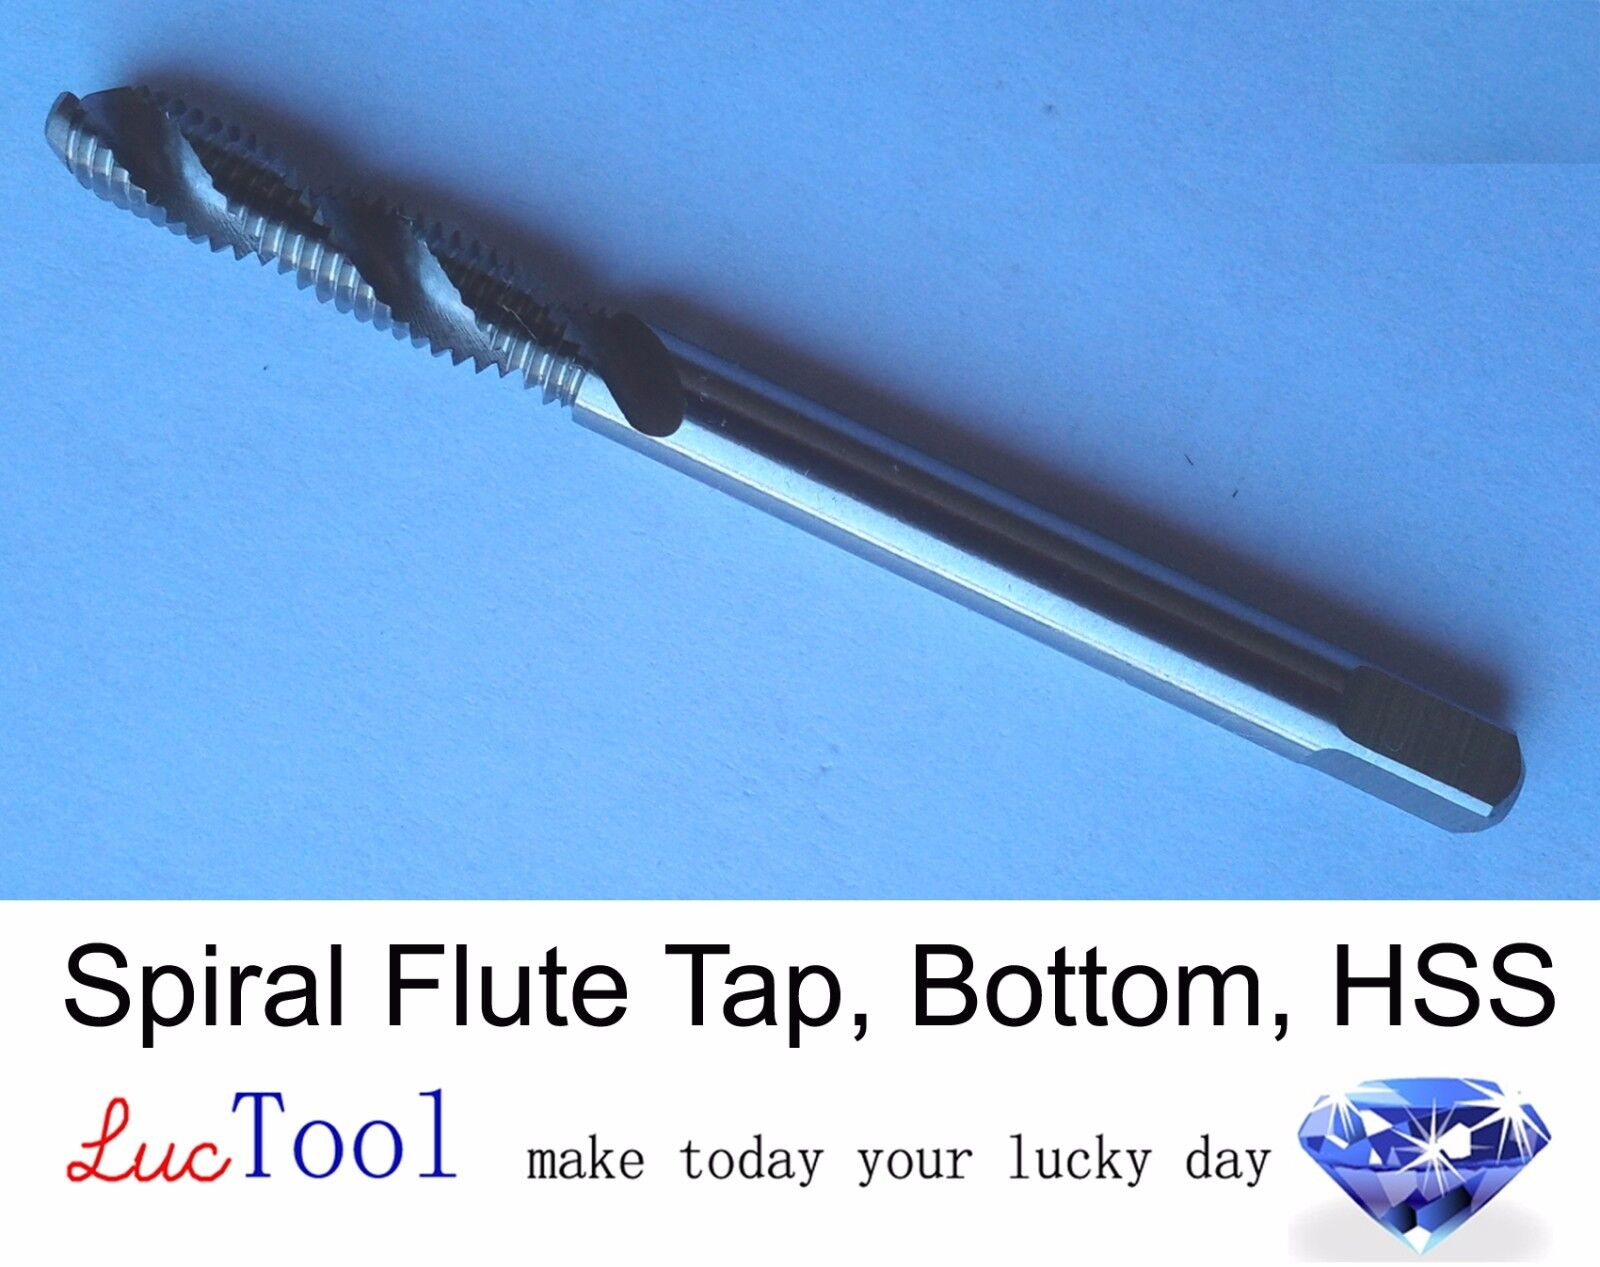 6-40 UNF Spiral Point Tap Plug GH2 Limit 2 Flute HSS Gun Tap Uncoated Thread